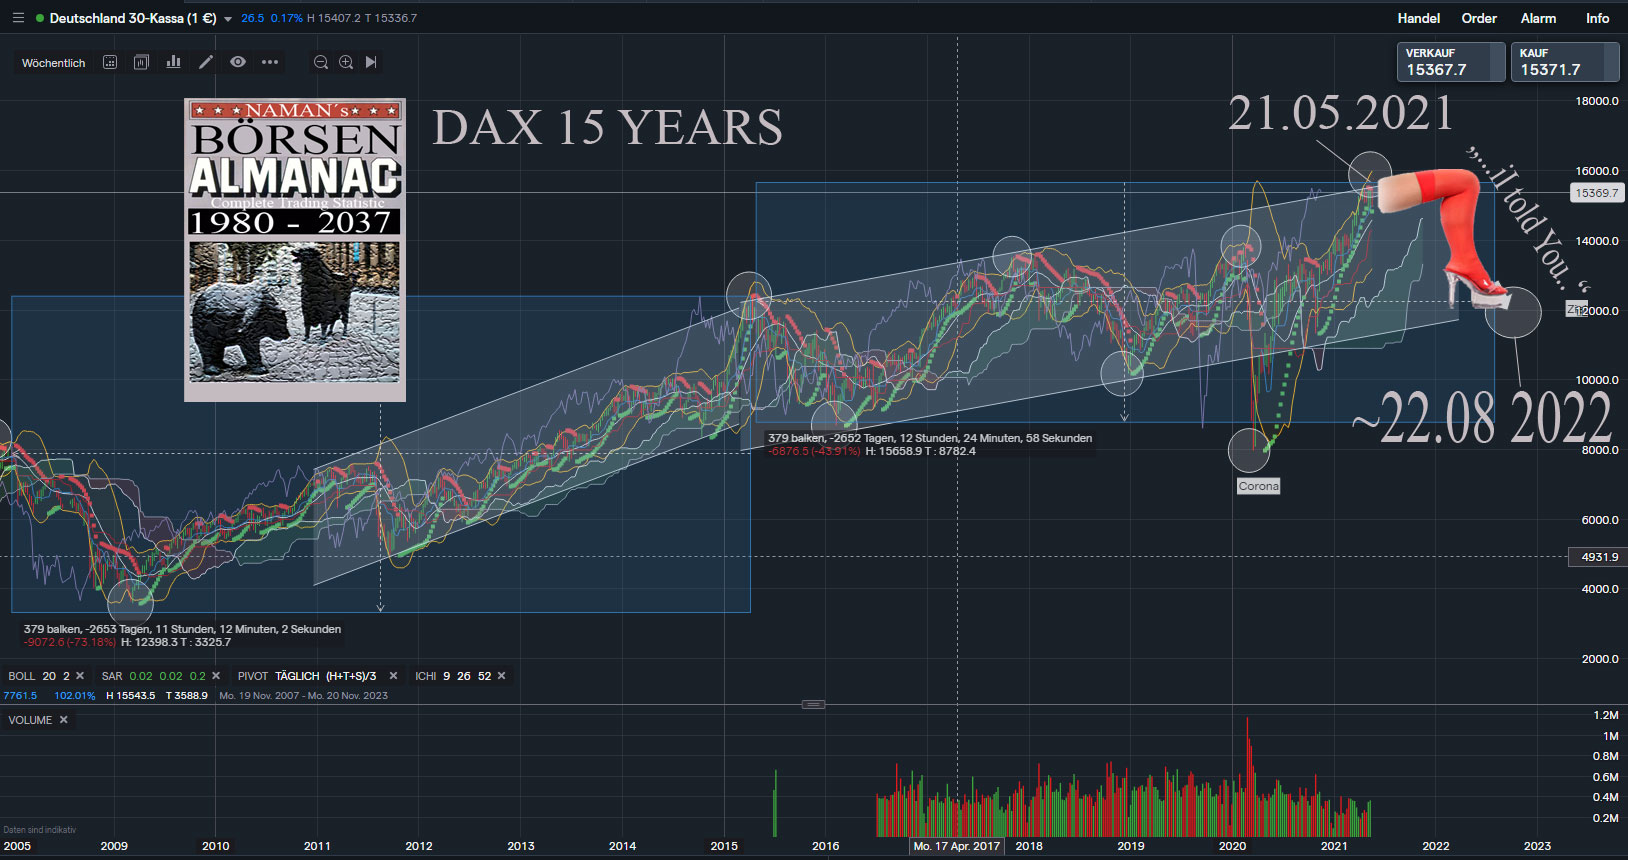 dax-15-years-05-2021.jpg